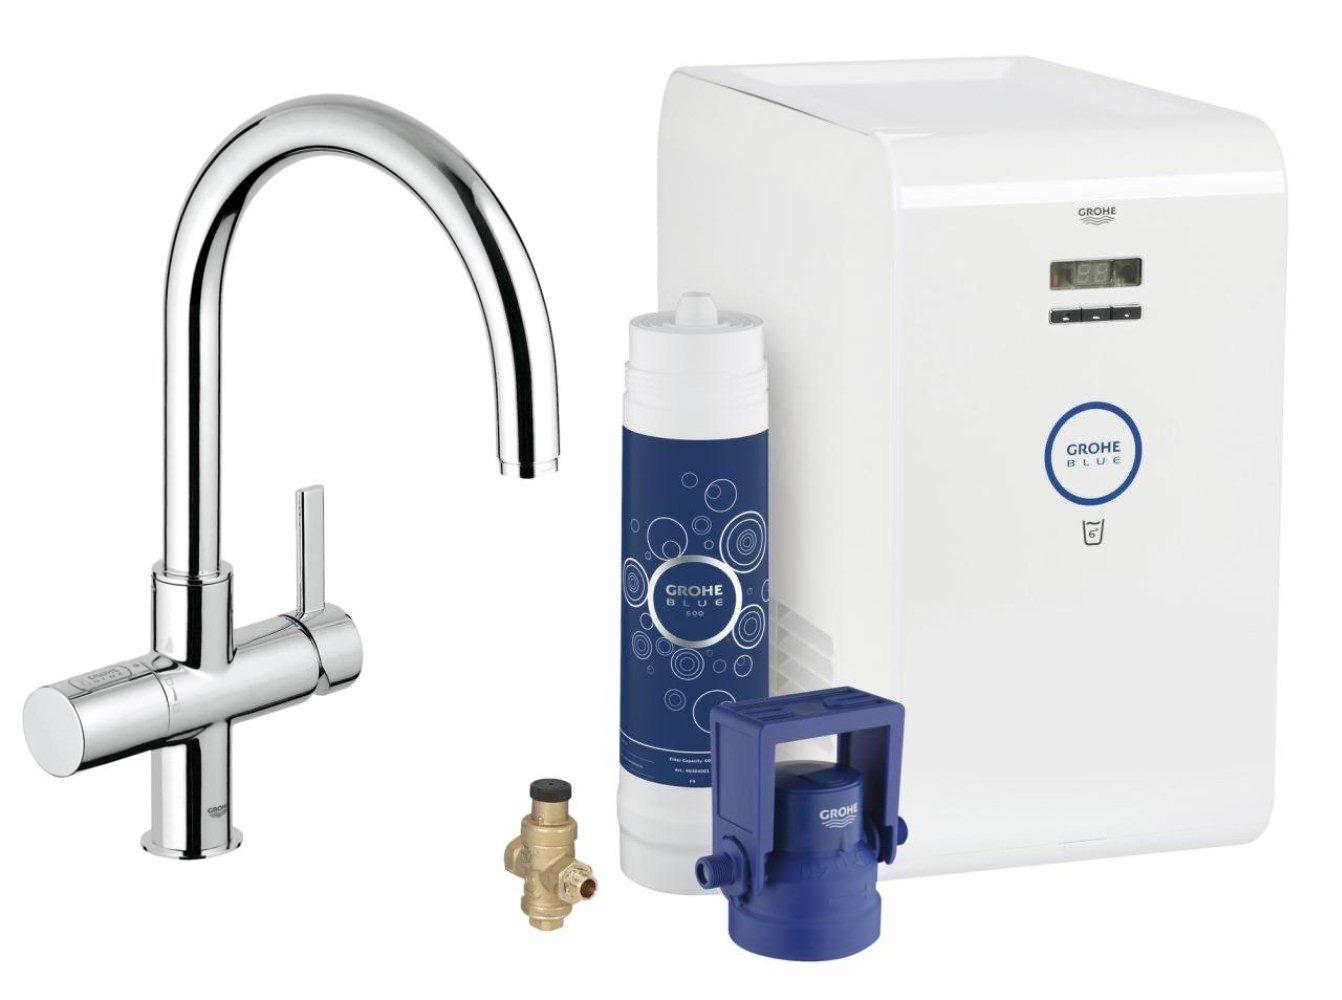 grohe blue single lever c spout kitchen sink mixer tap chrome 31382000. Black Bedroom Furniture Sets. Home Design Ideas